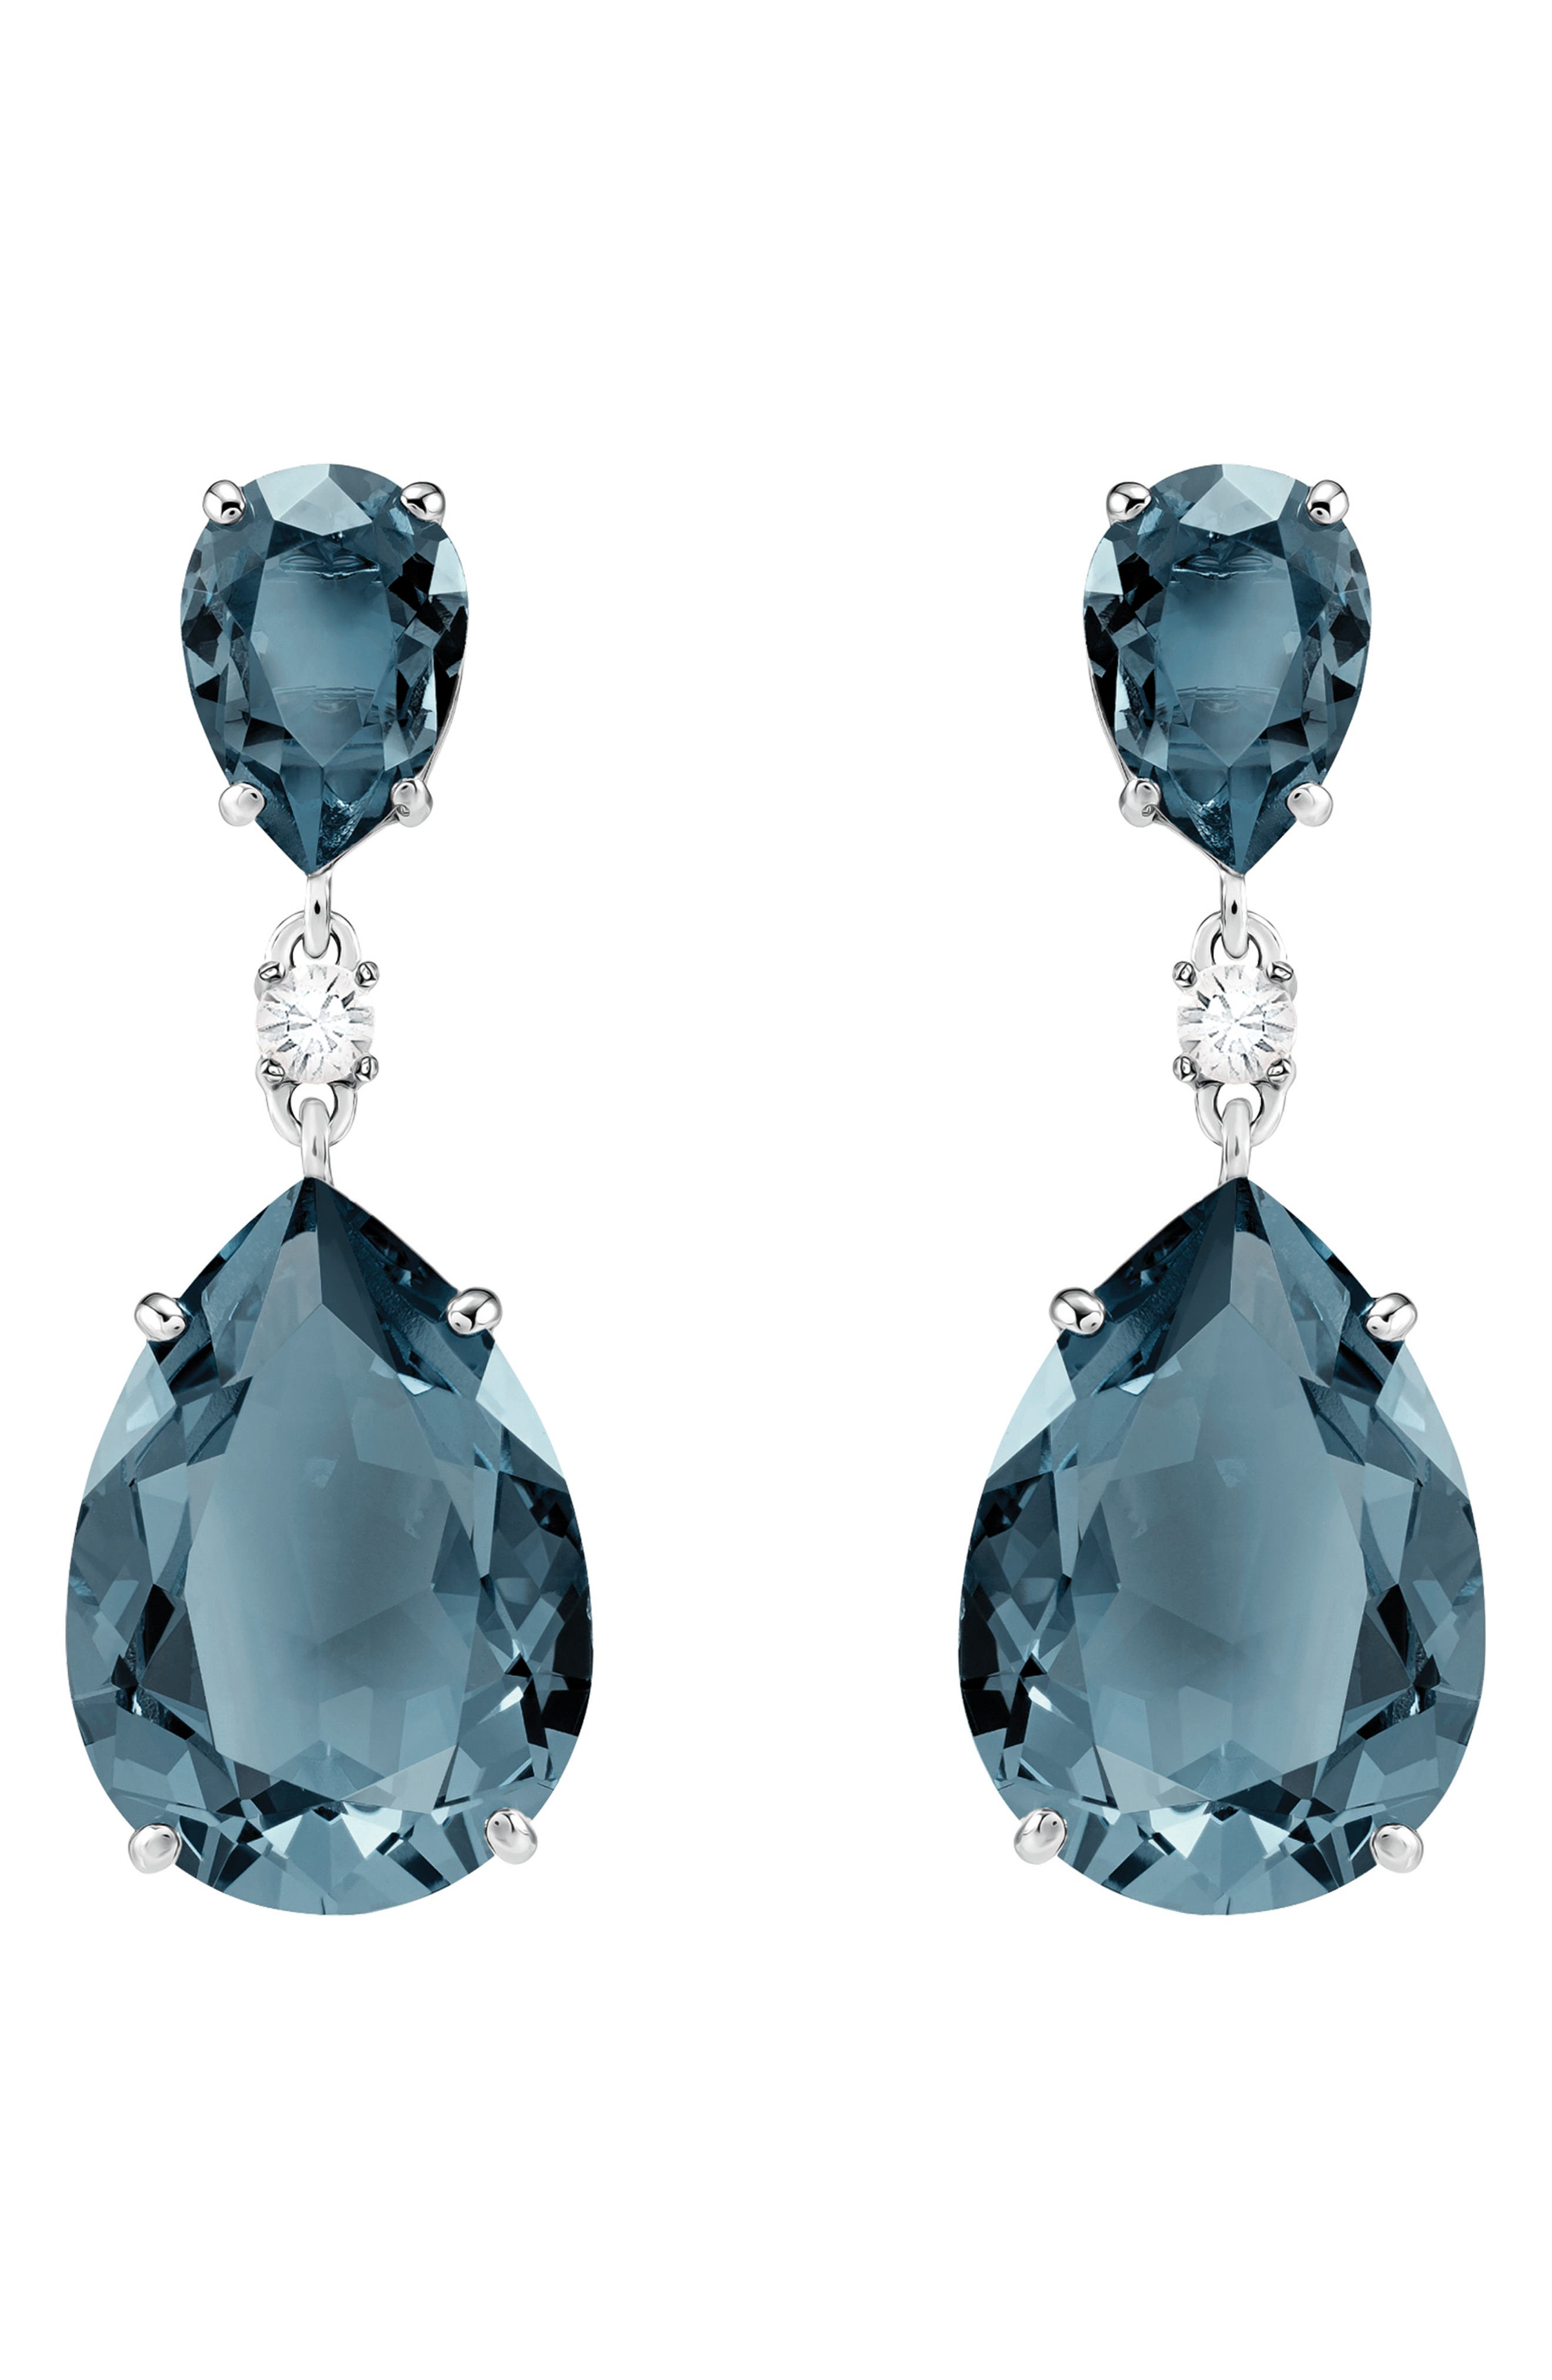 Pear Crystal Drop Earrings,                             Main thumbnail 1, color,                             TEAL